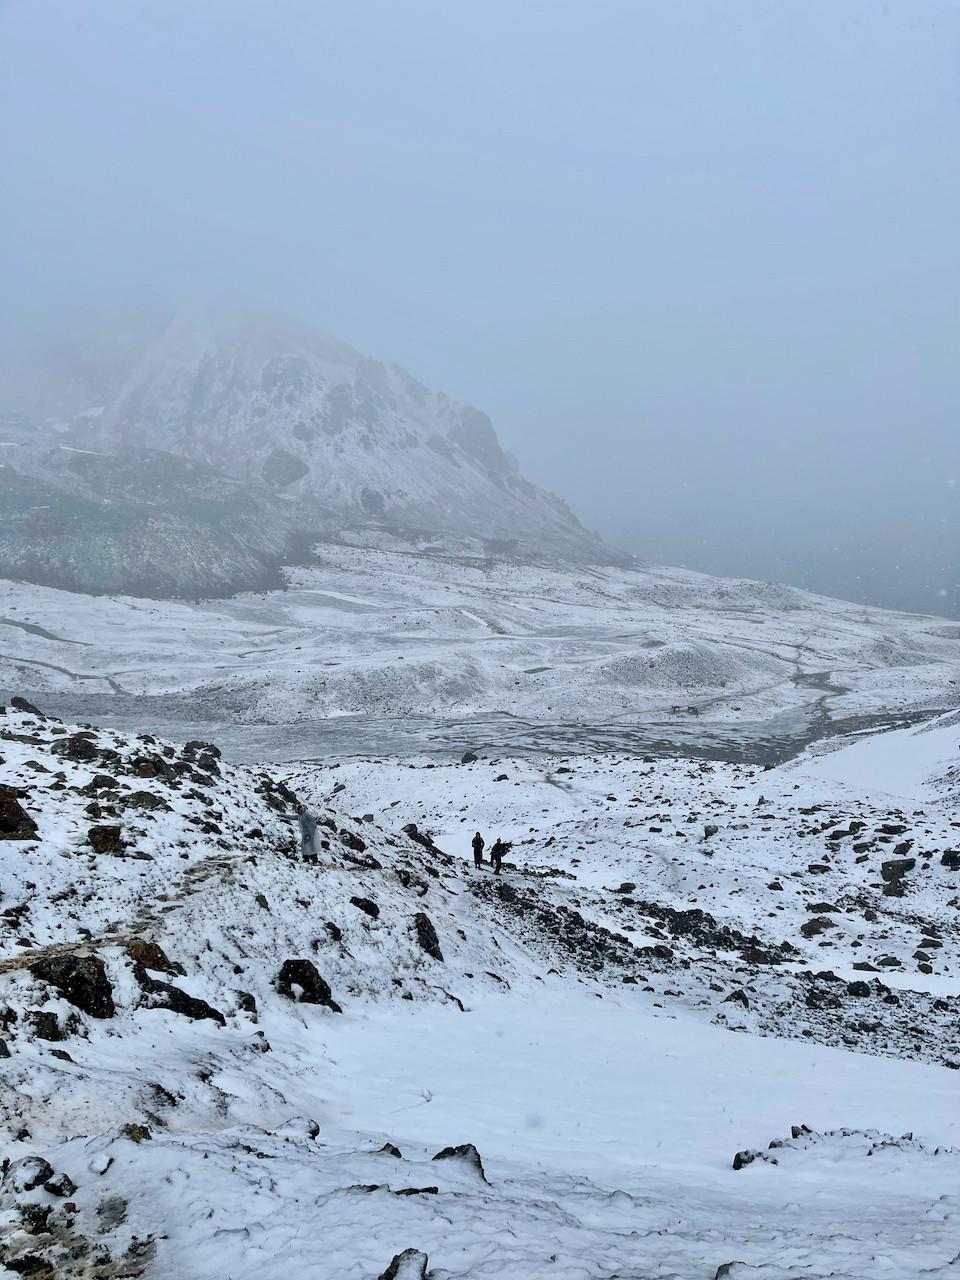 Ala Kul Kyrgyzstan Snow Hike Travel